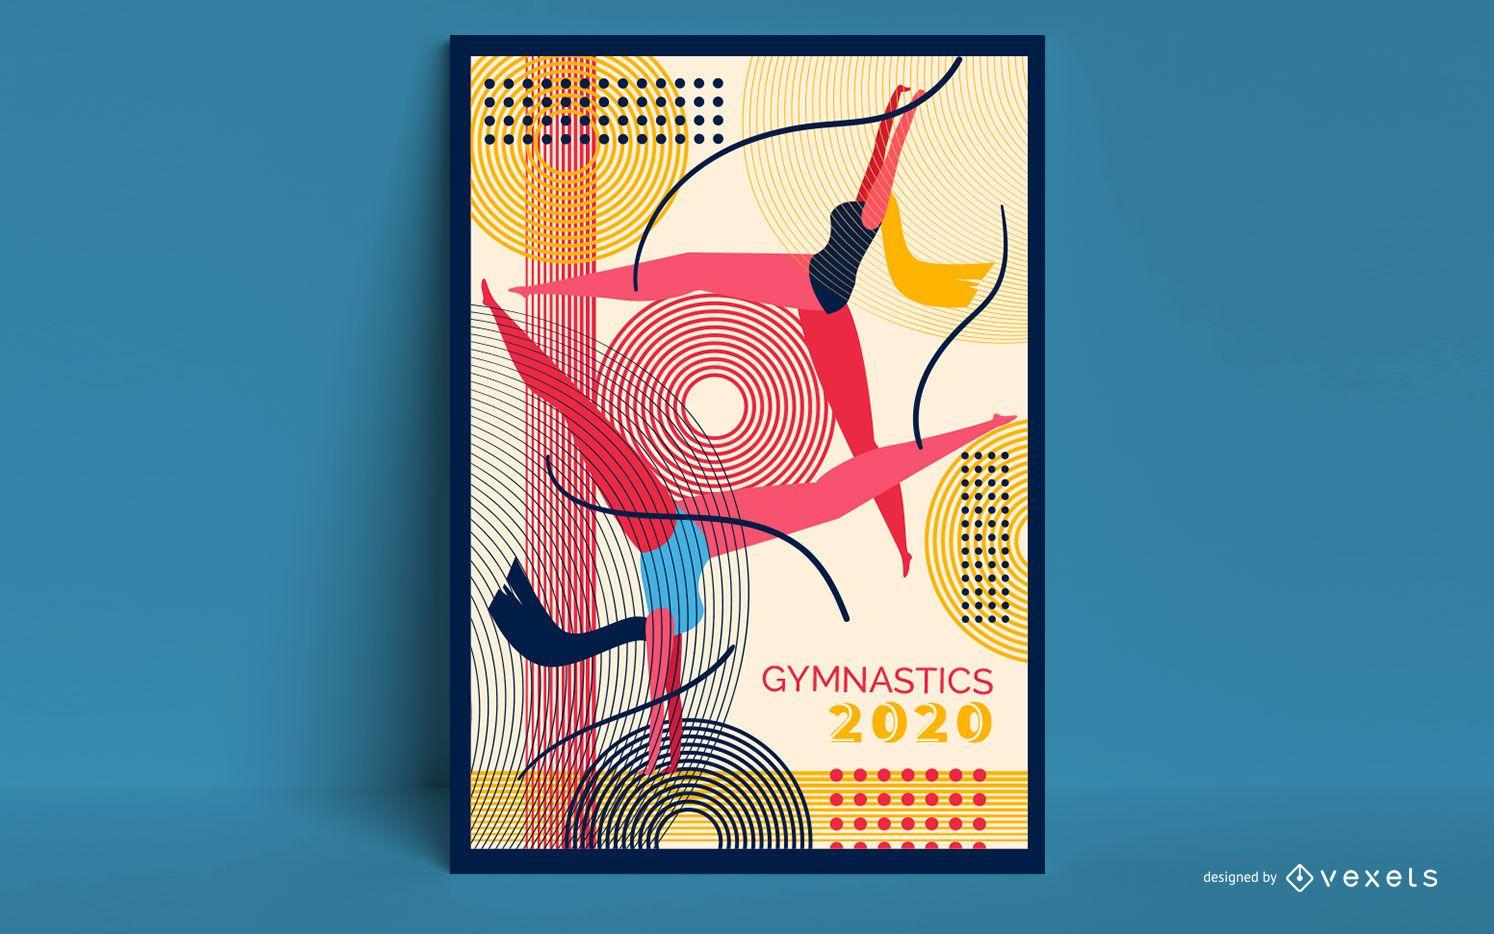 Gymnastics Tokyo 2020 Poster Design